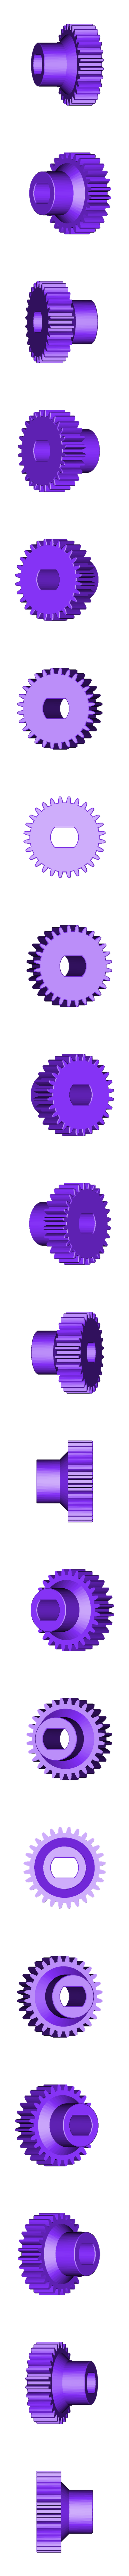 Truck_V4_Centerdiff_Outputgear2.STL Download STL file 3D Printed Rc Truck V4 • 3D printable template, MrCrankyface